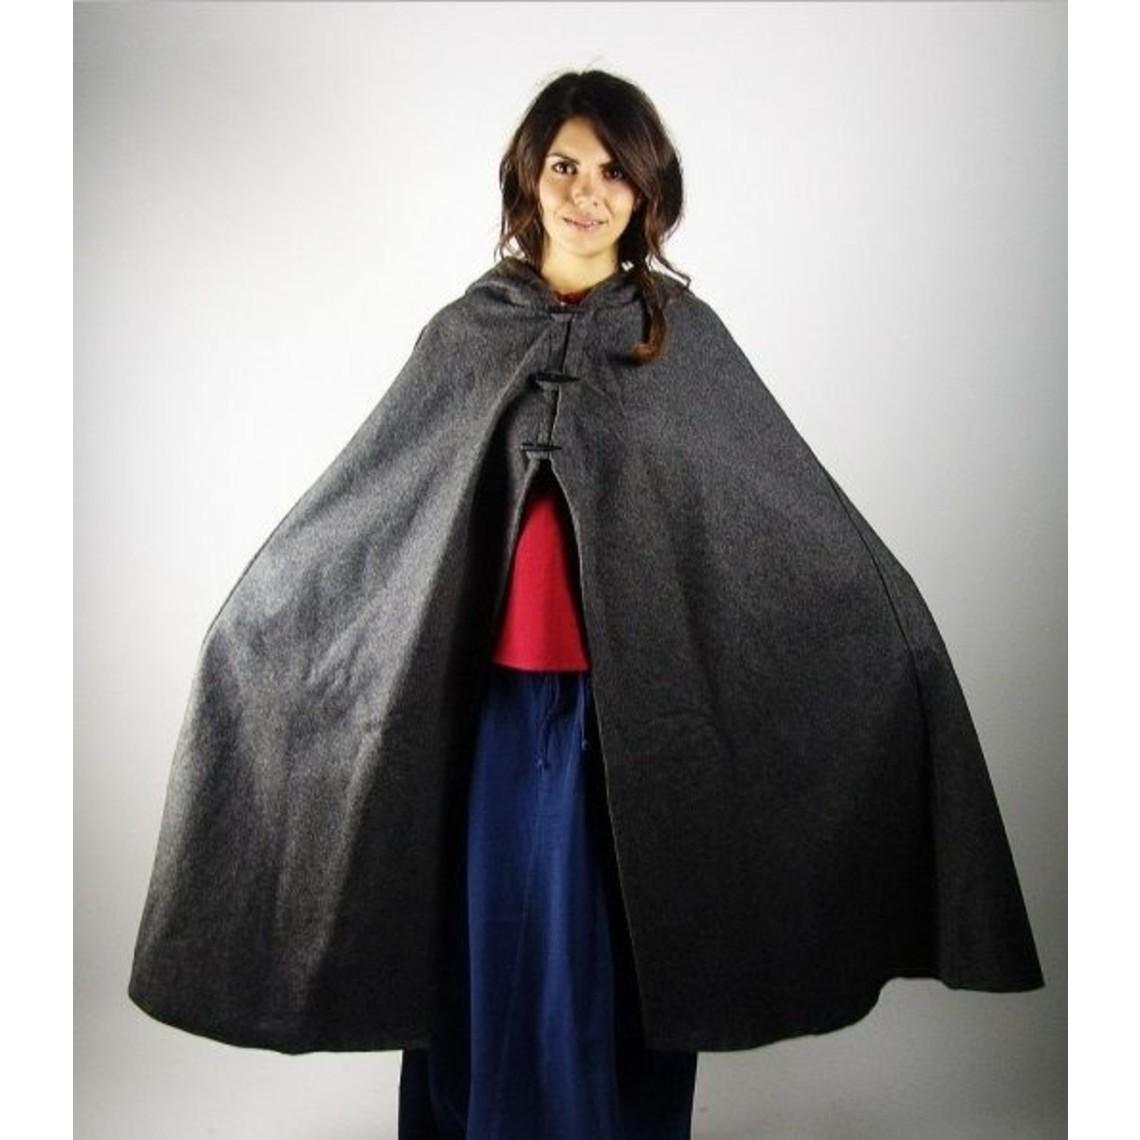 Leonardo Carbone Wool cloak Felis, green